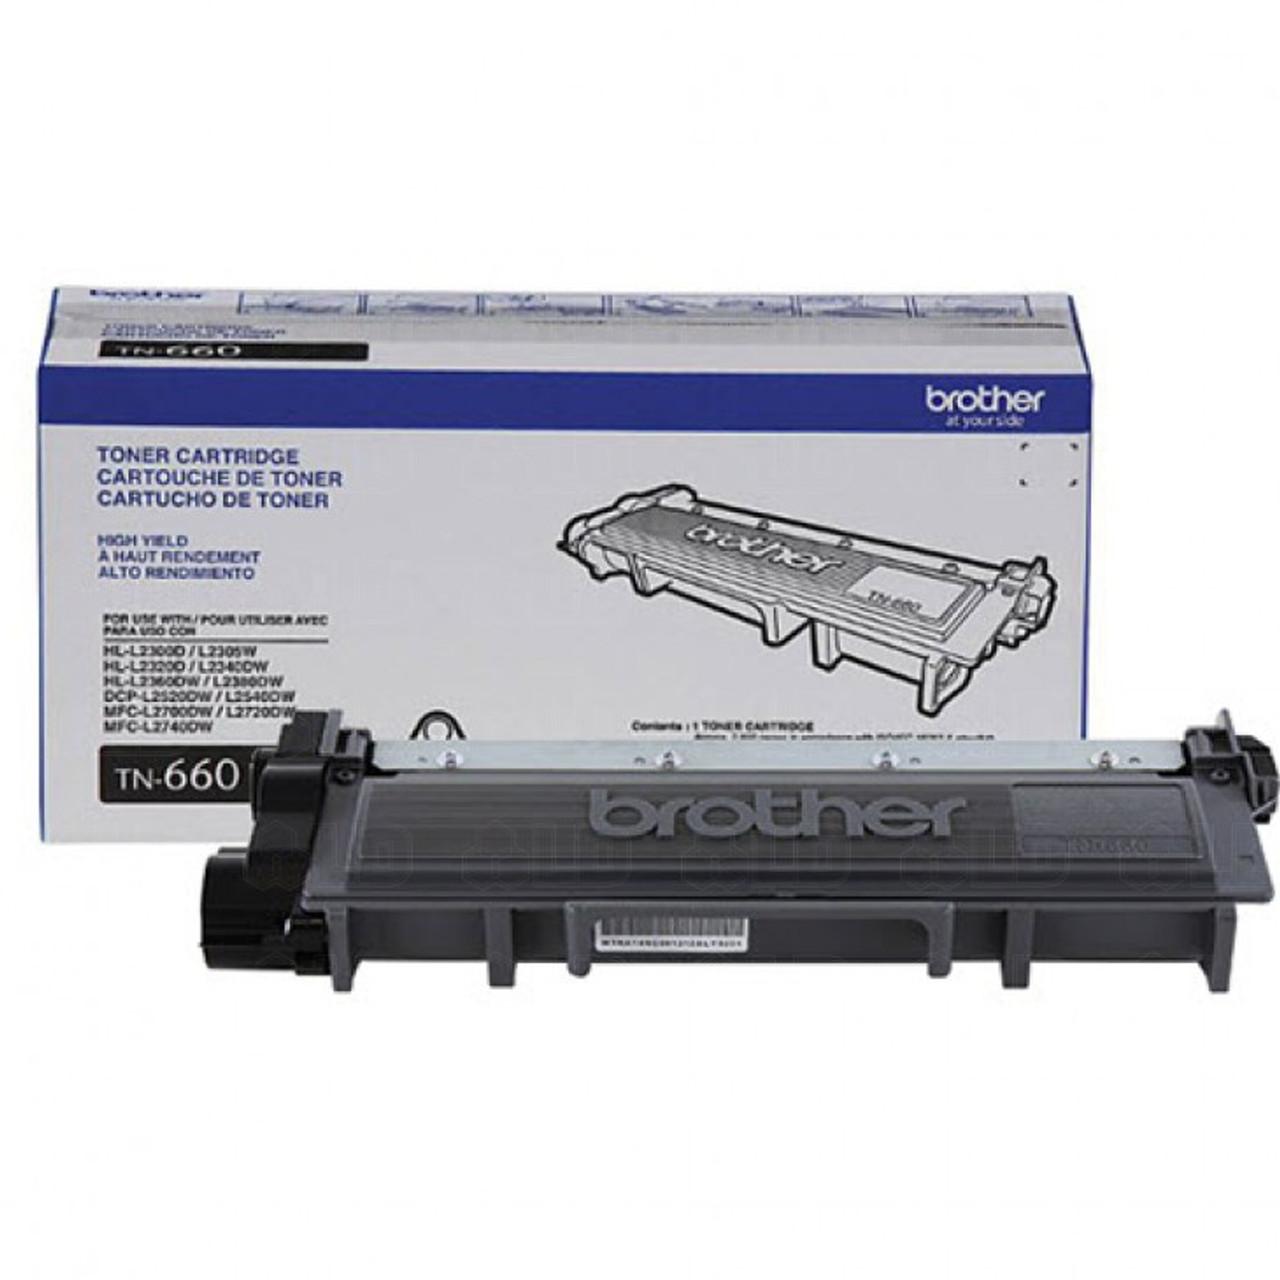 Brother DCP-L2520DW Black Original Toner Standard Yield 1,200 Yield